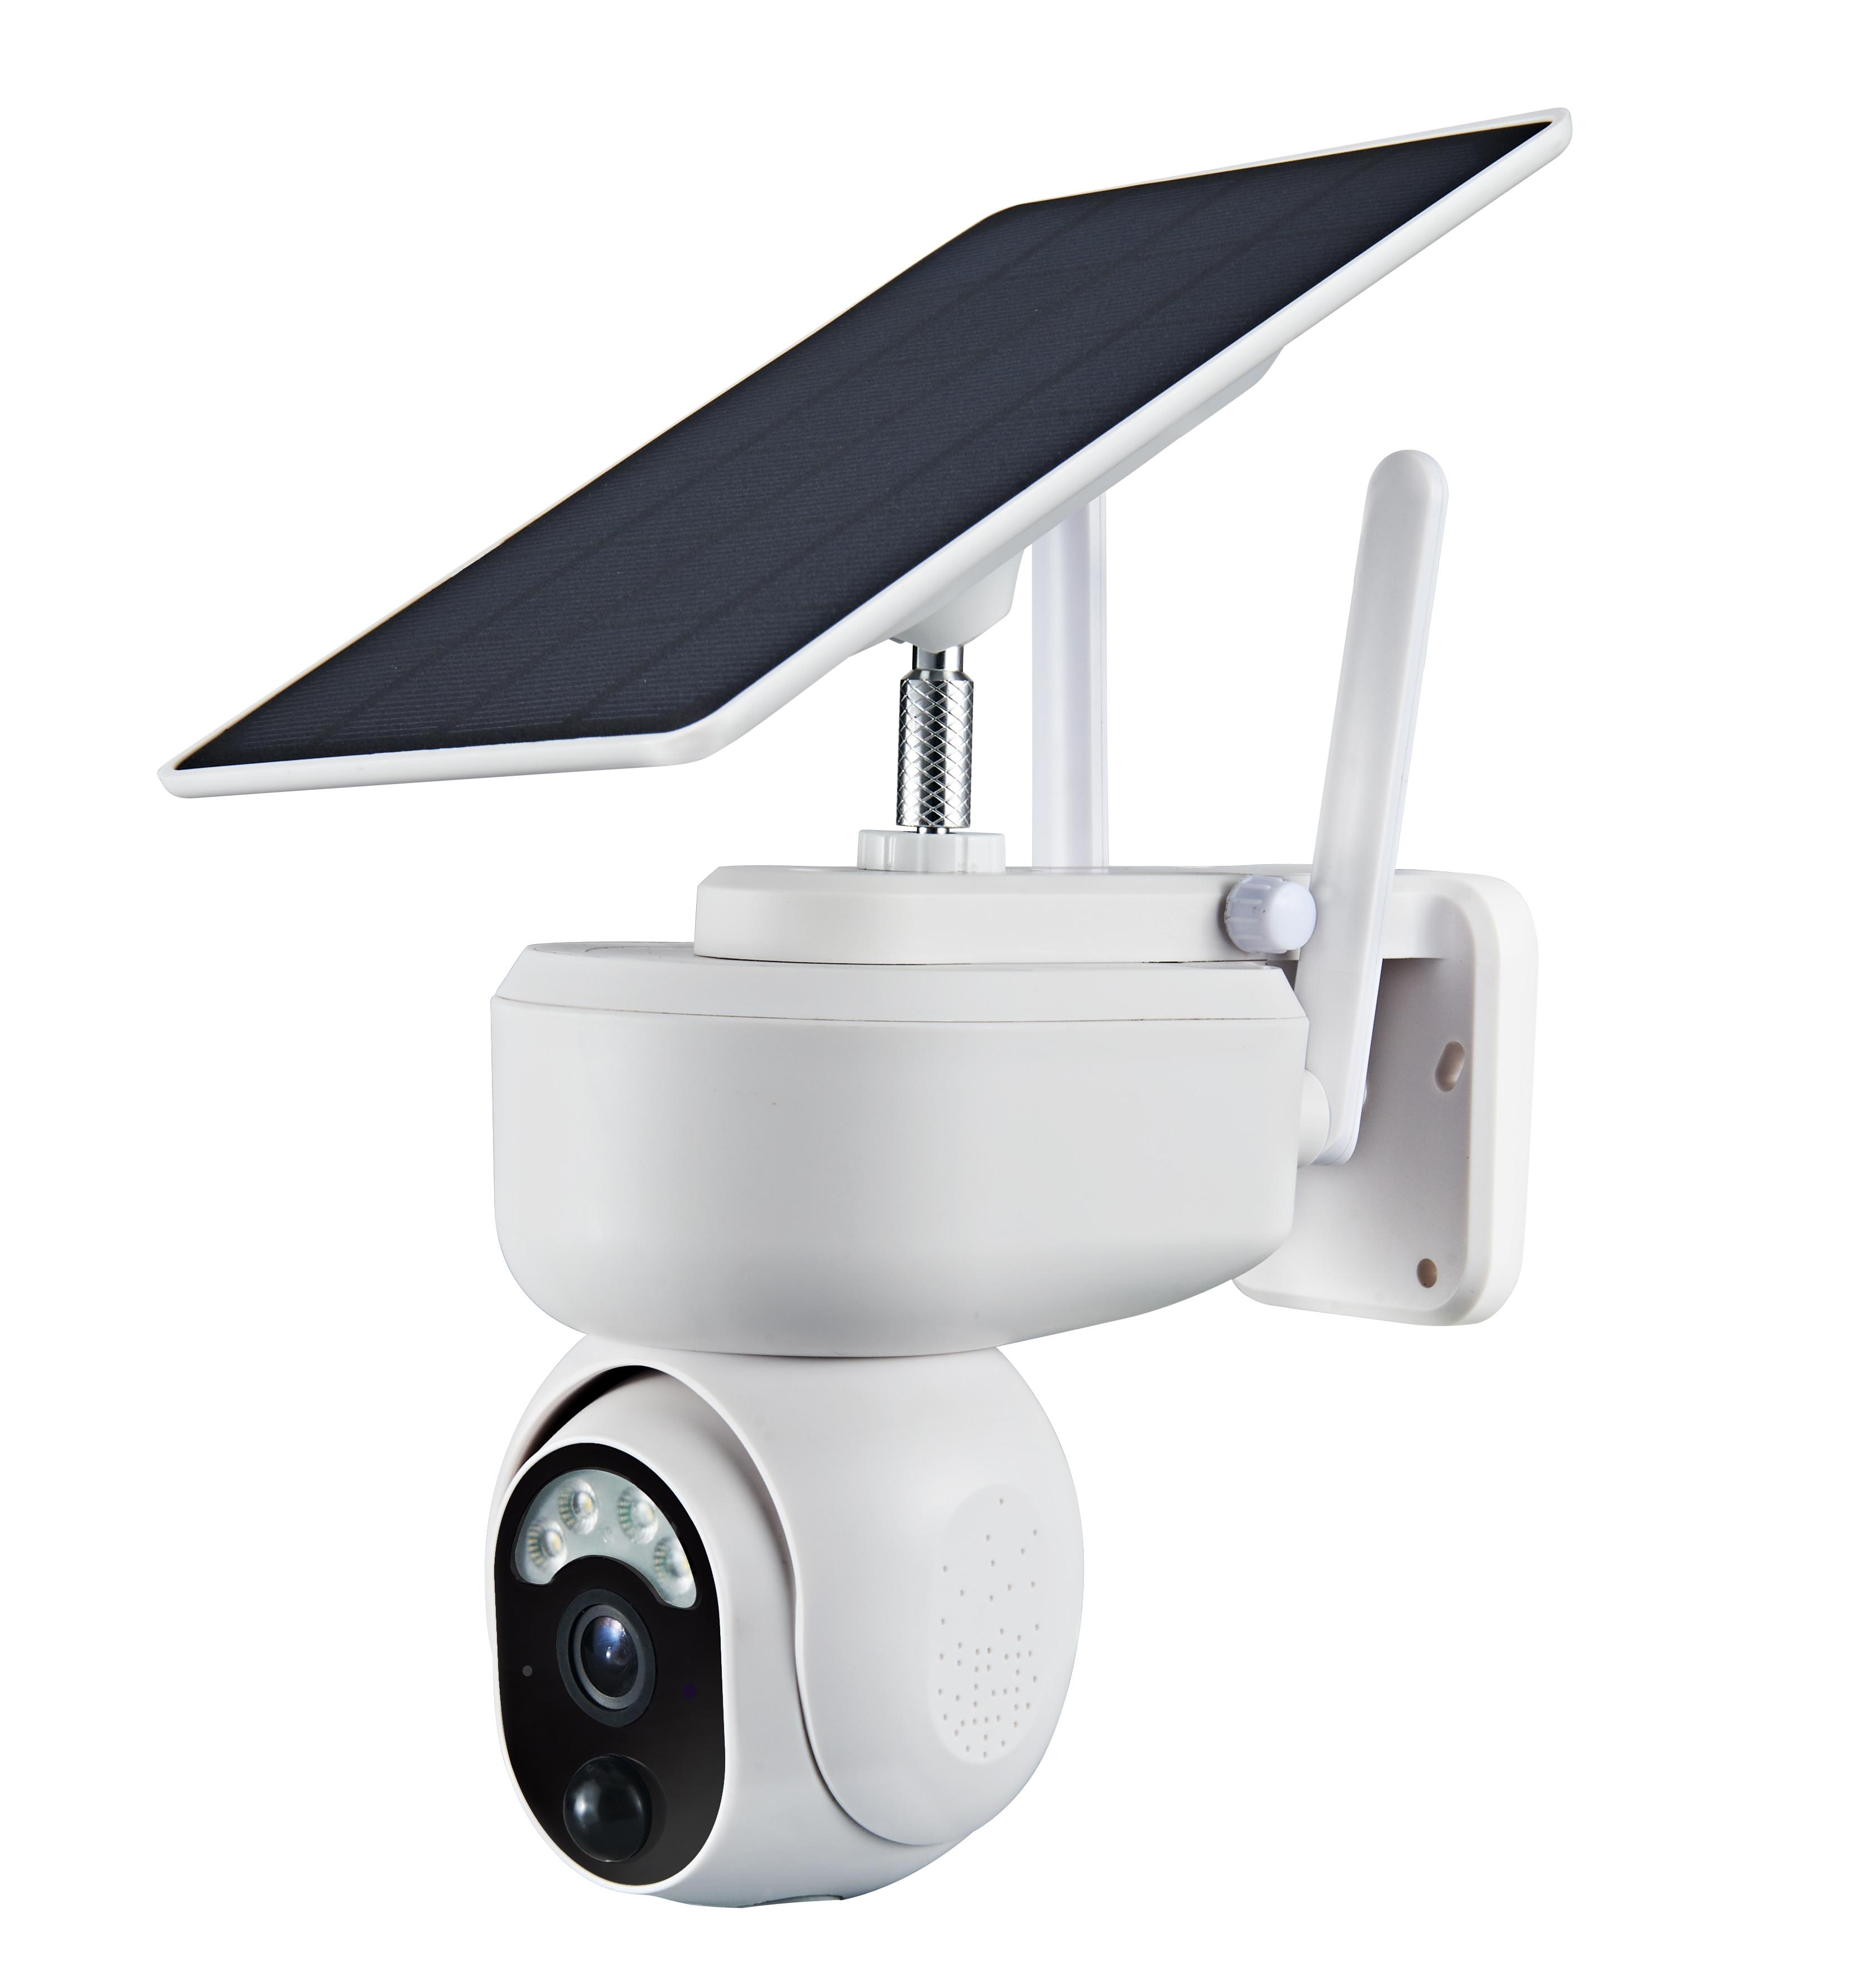 S30 ذكي الخلايا الشمسية واي فاي كاميرا لا سلكية IP65 في الهواء الطلق مزرعة الرصد